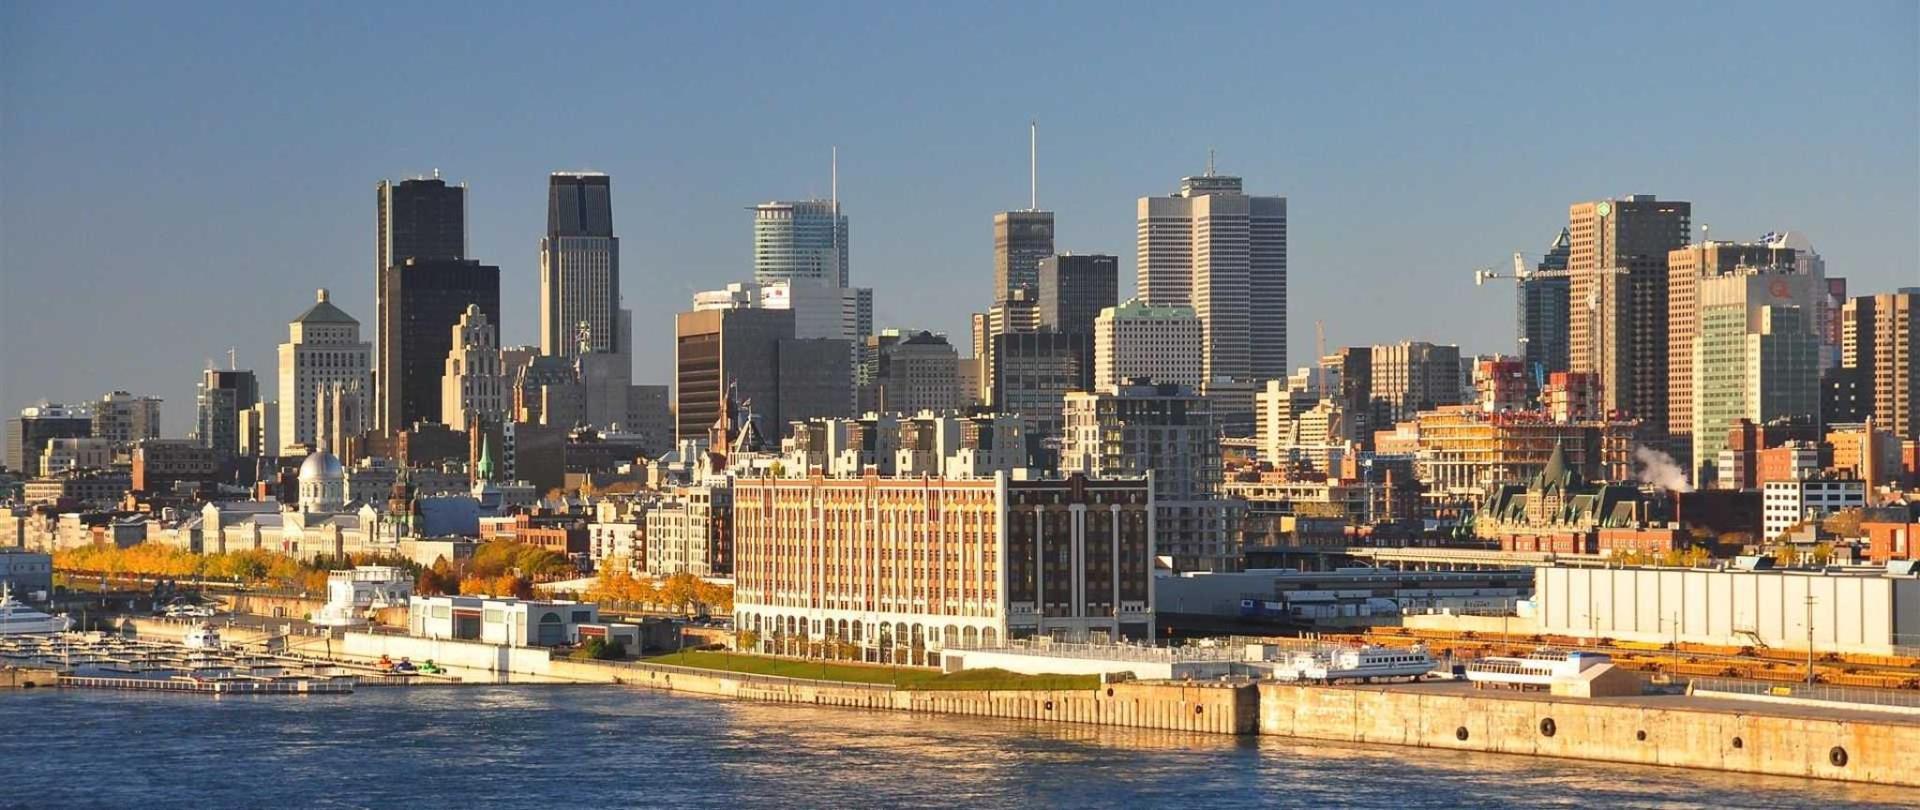 montreal-skyline-2011.jpg.1920x810_default.jpeg